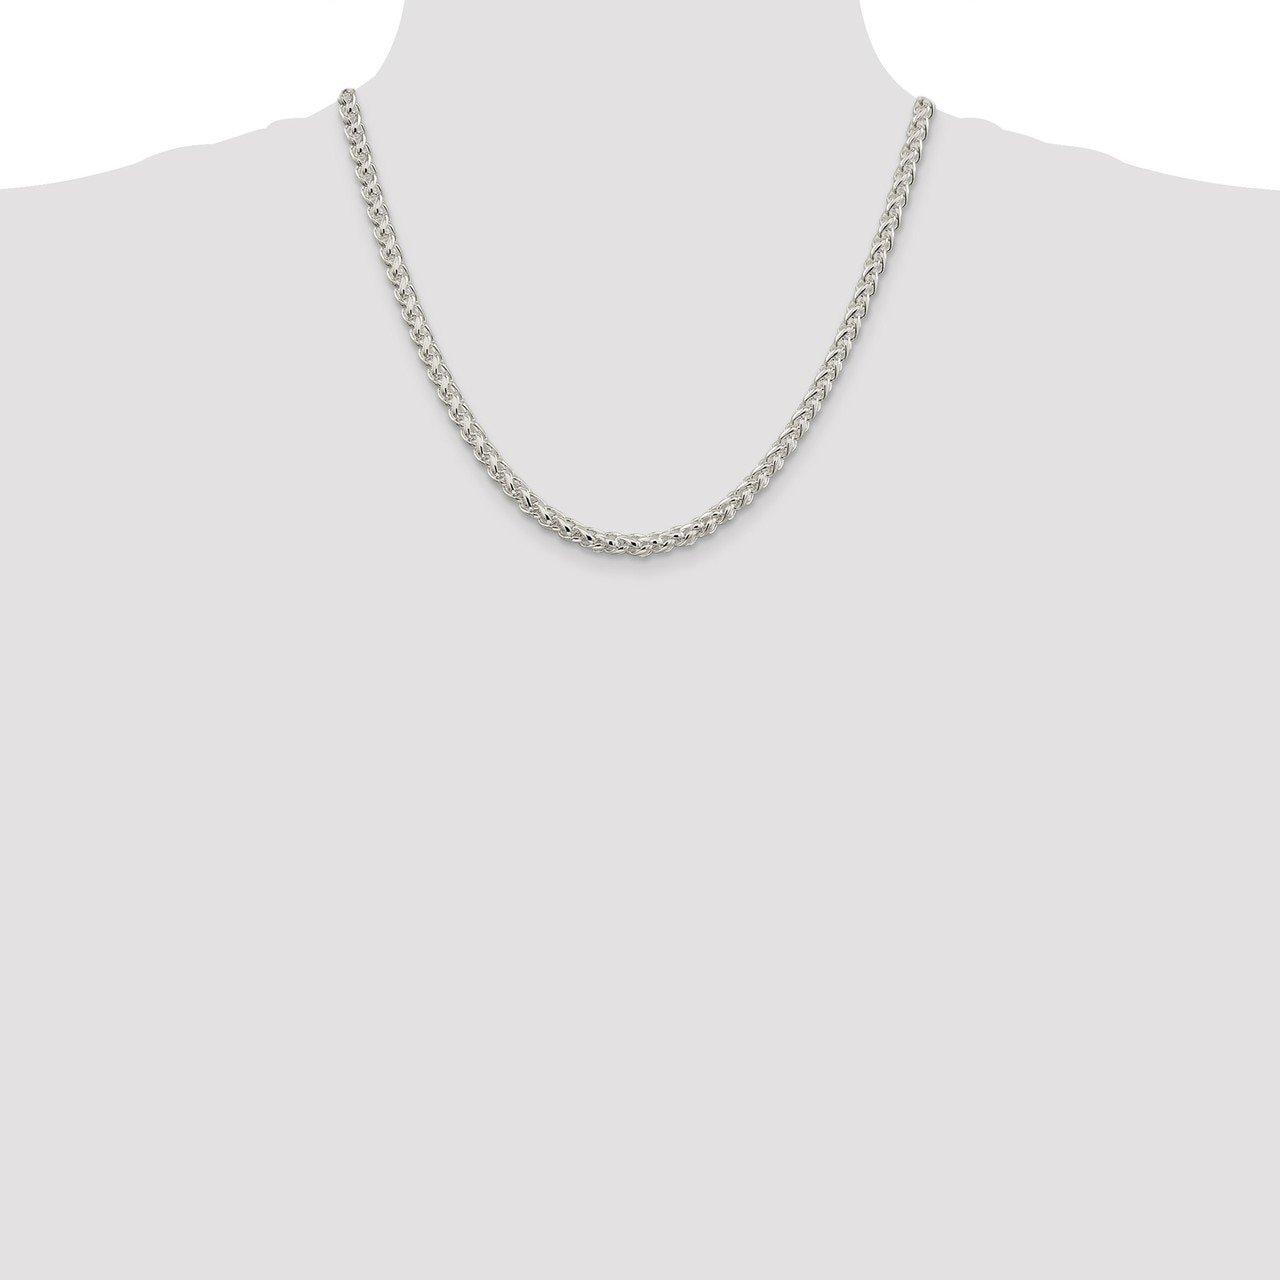 Lex /& Lu Sterling Silver 5mm Round Spiga Chain Necklace